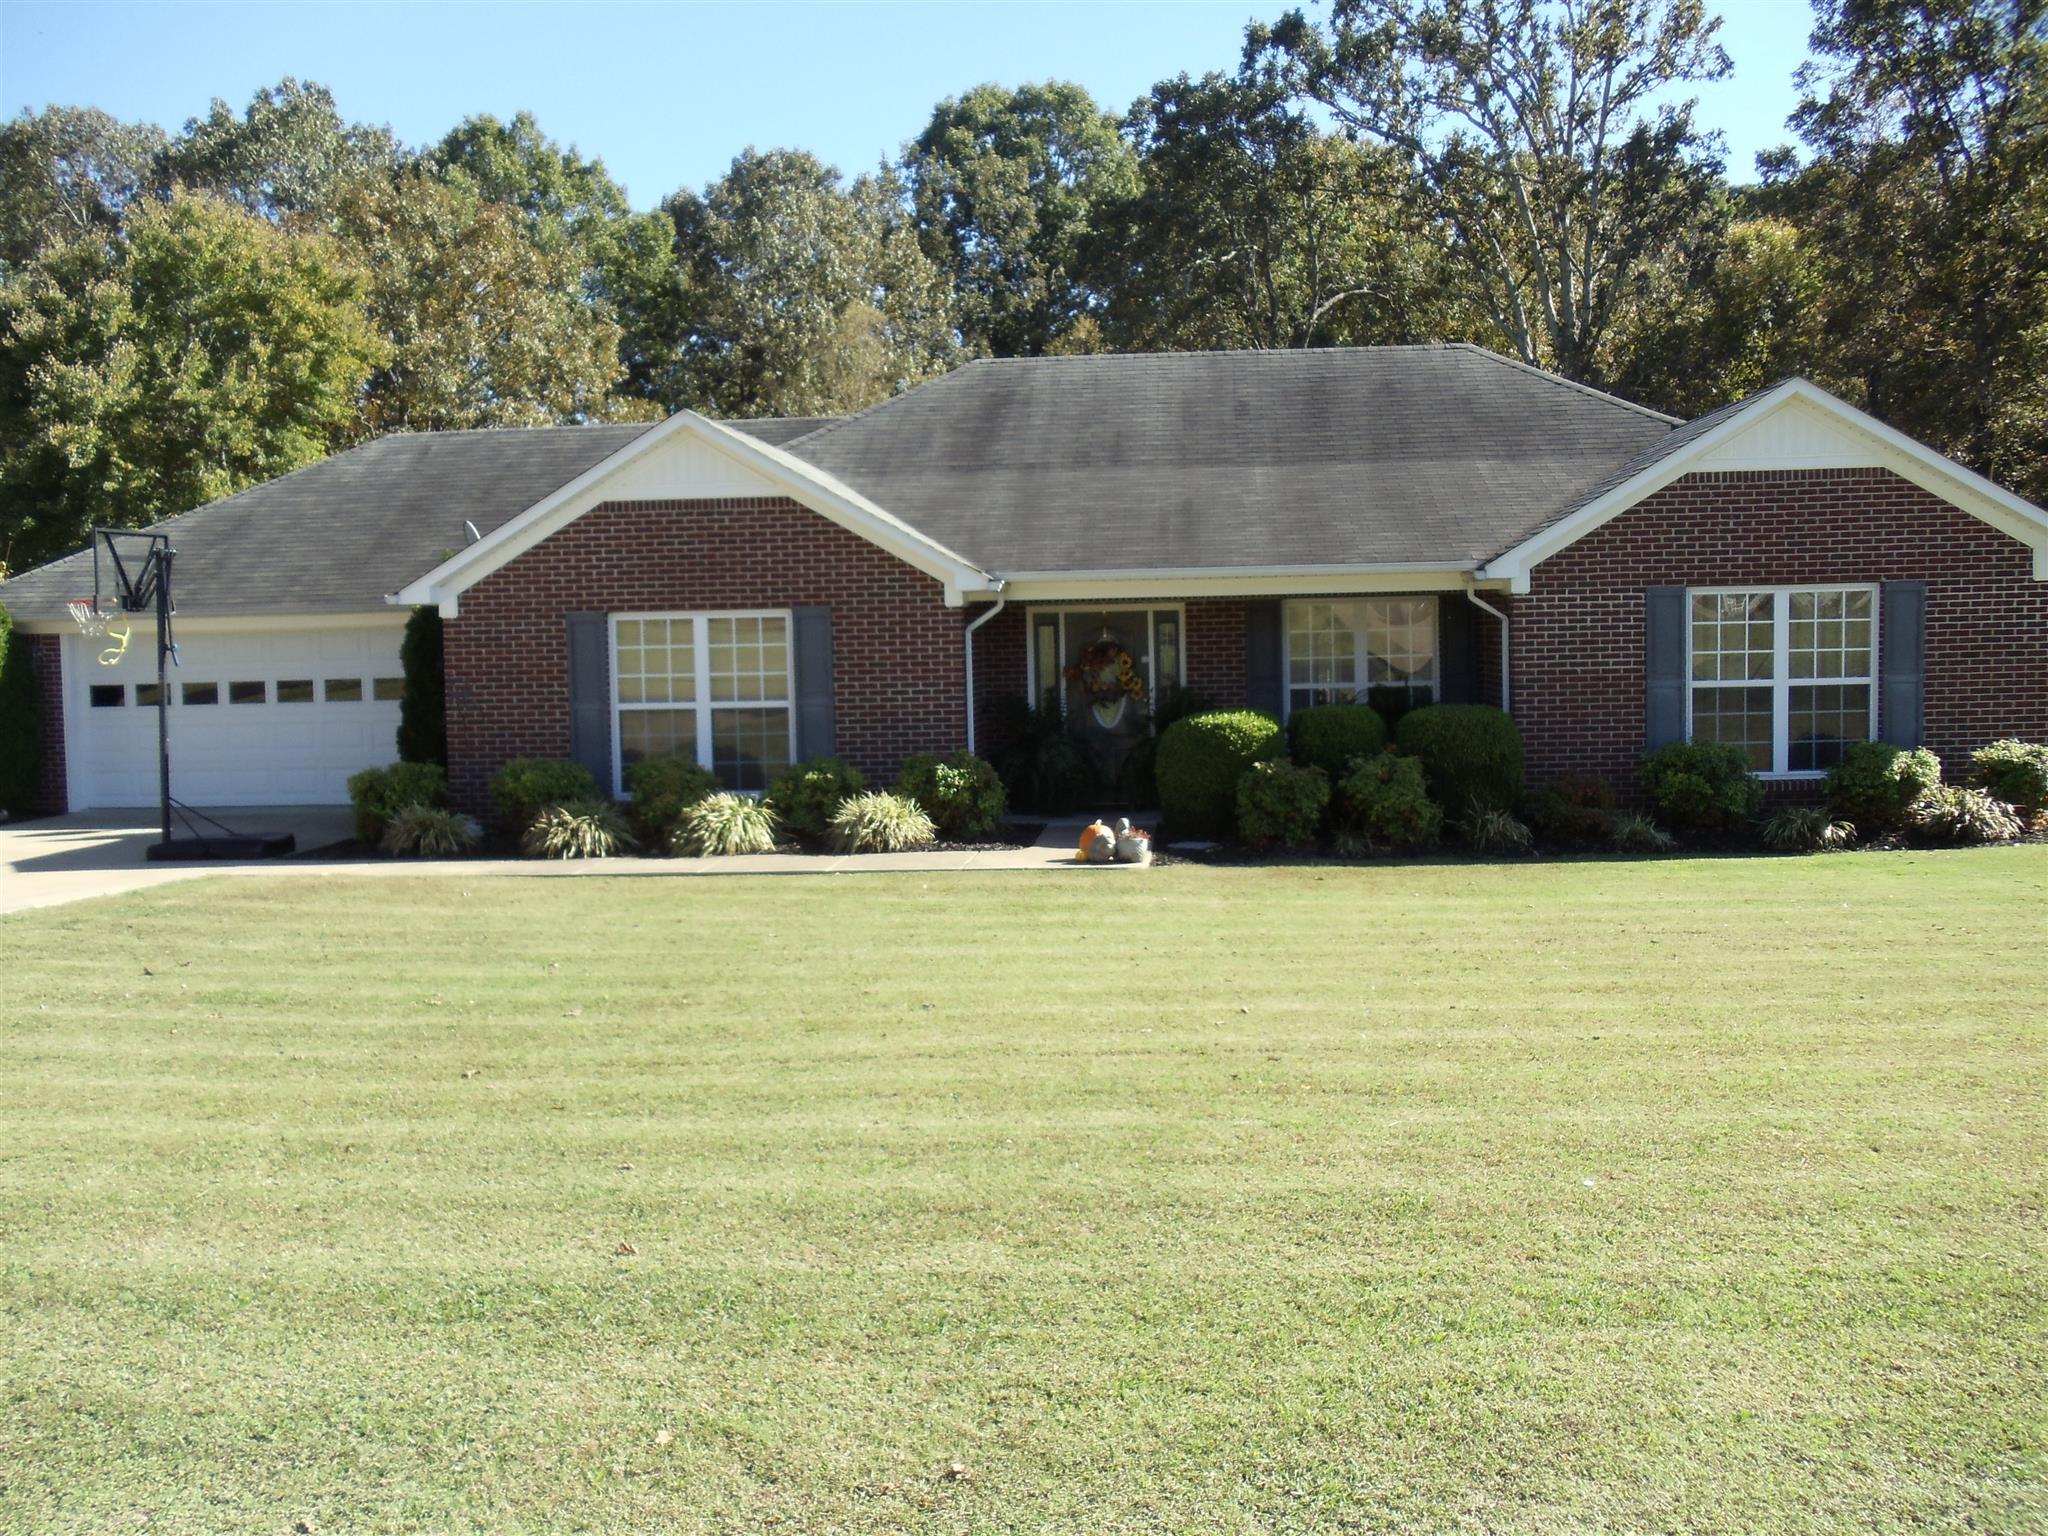 4 Harding Rd, Leoma, TN 38468 - Leoma, TN real estate listing